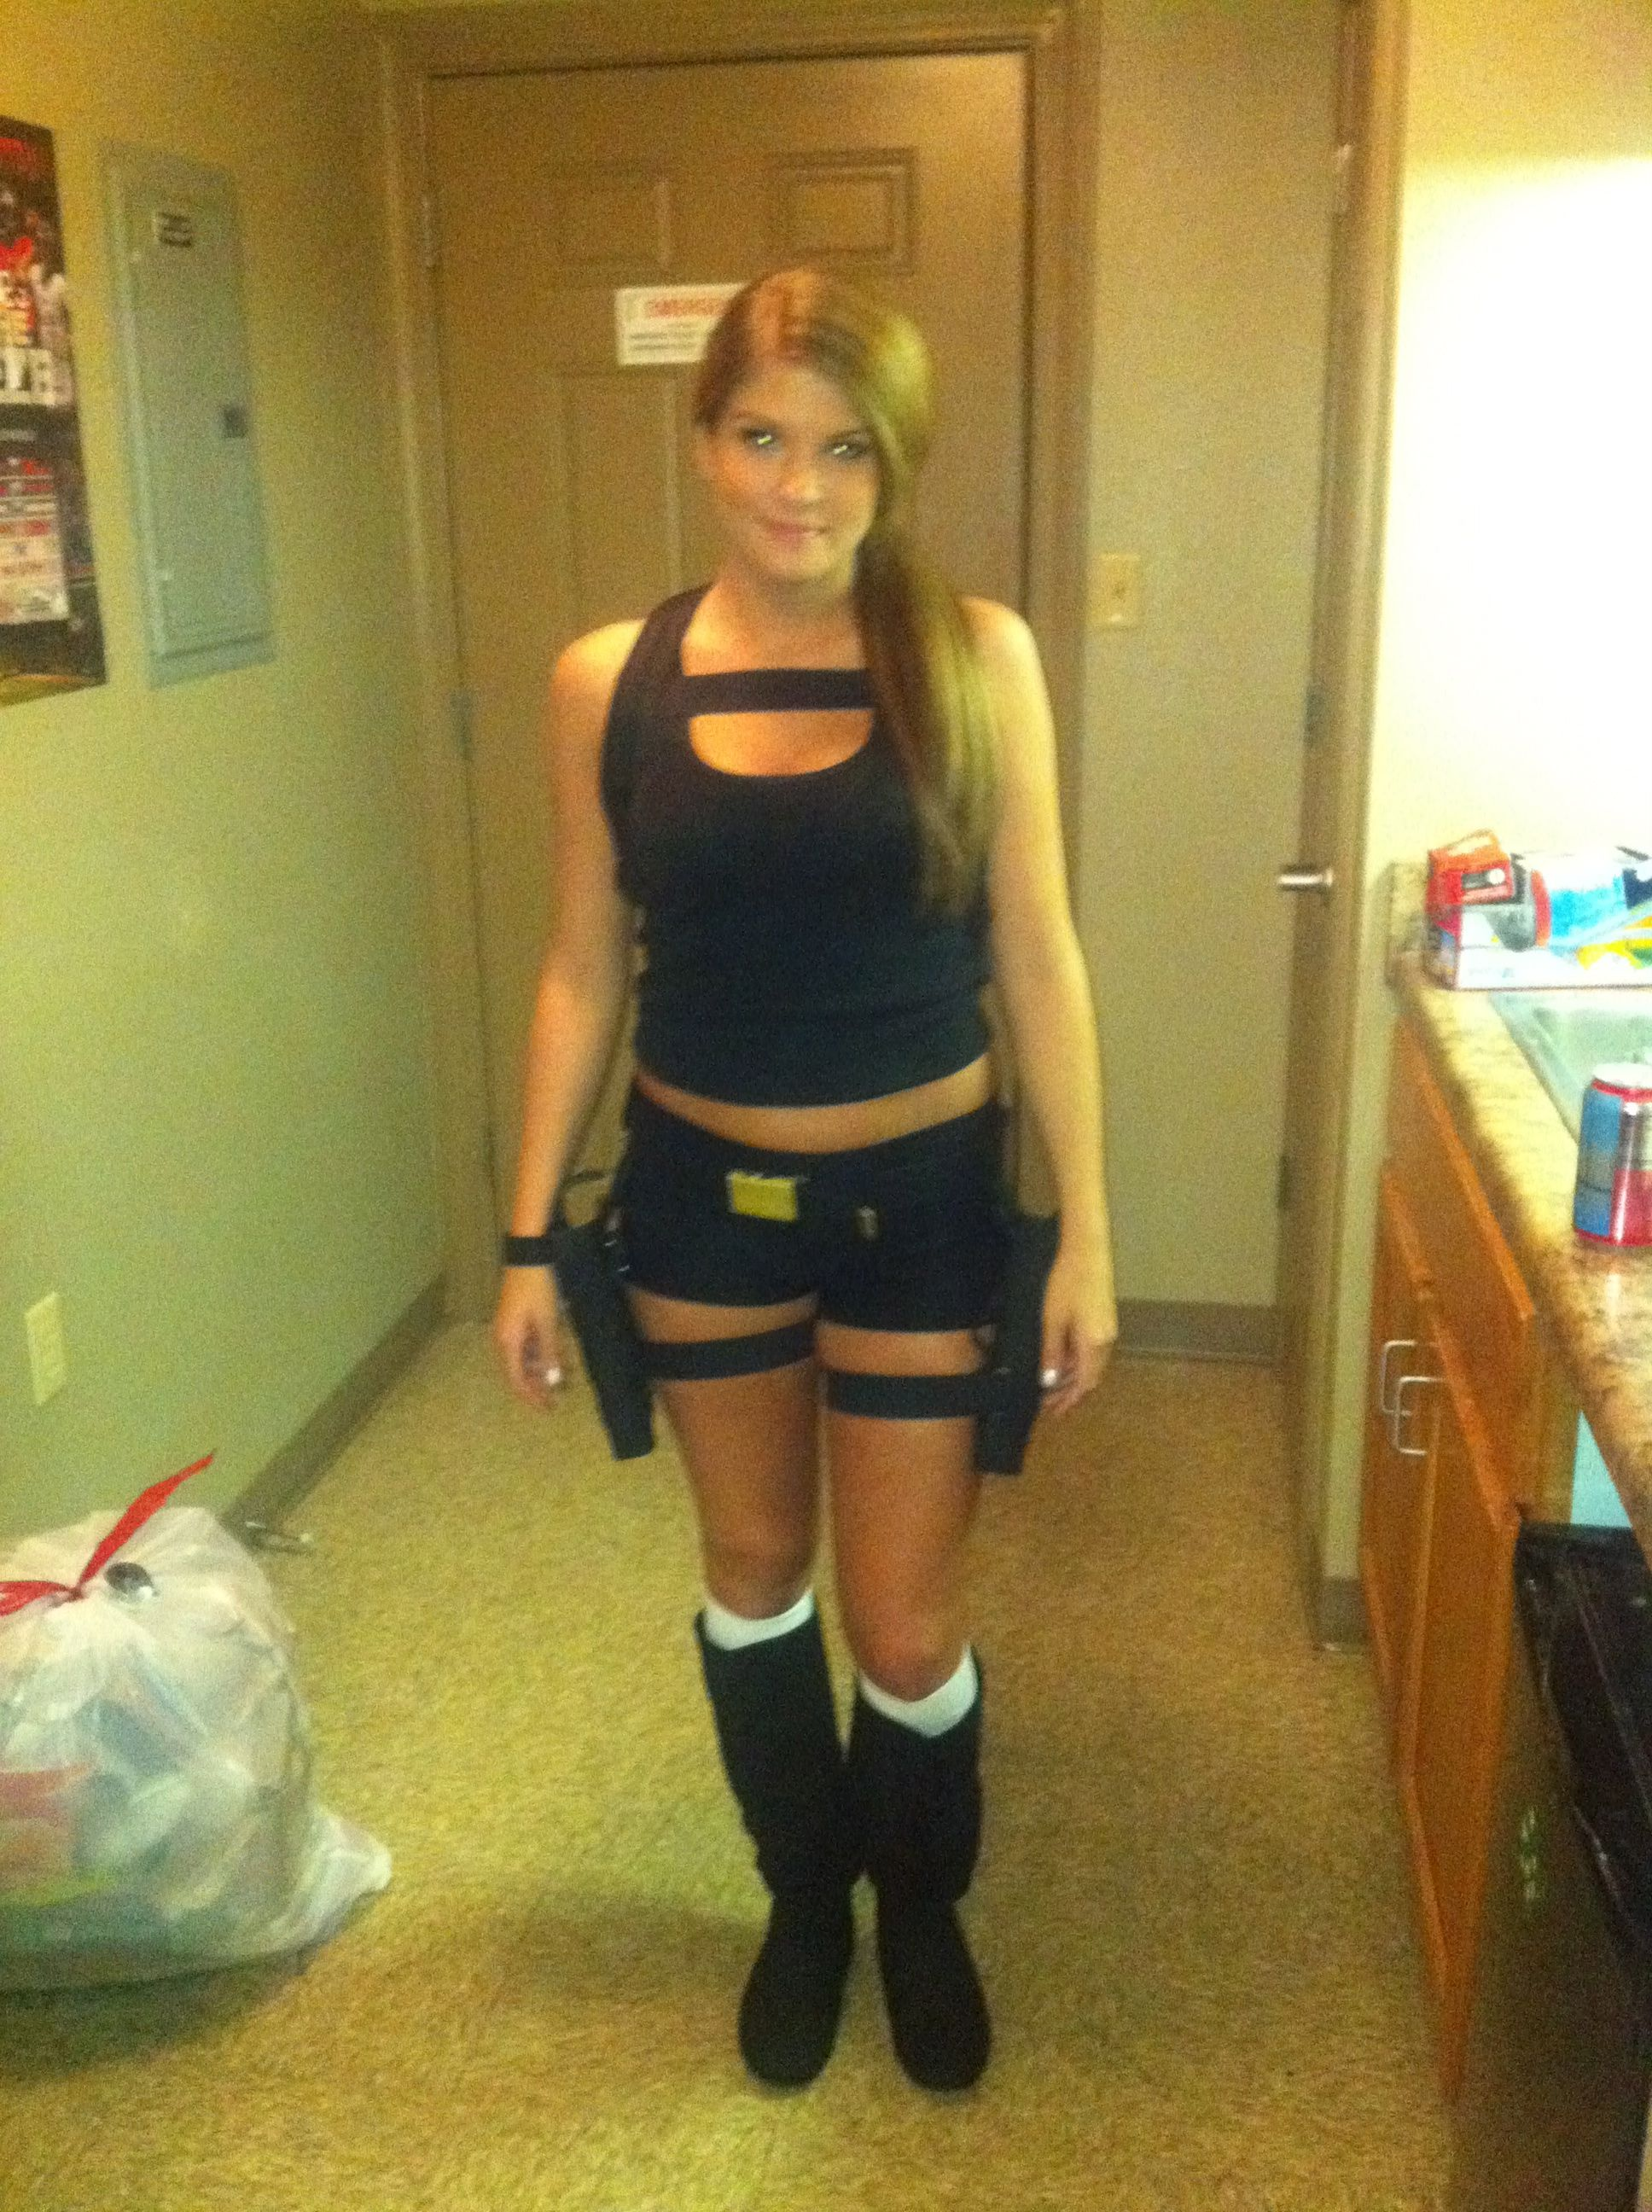 My Tomb Raider Laura Croft Diy Costume From 2 Years Ago